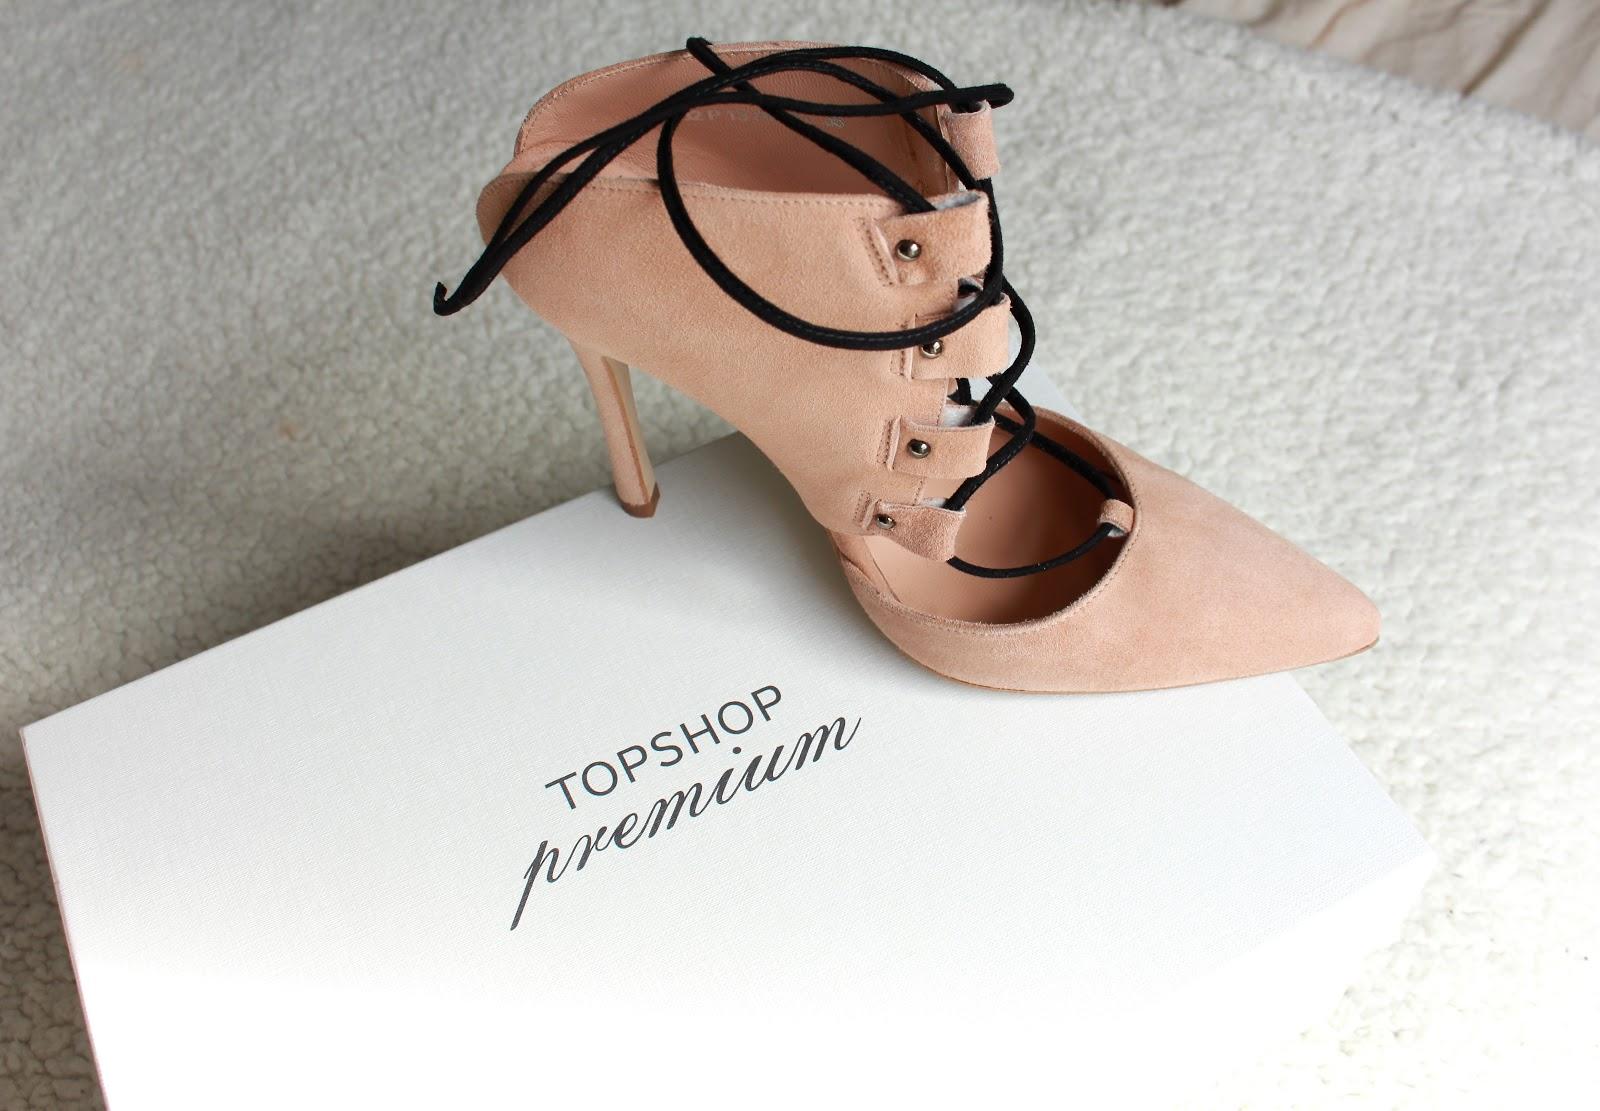 topshop premium, krystel couture, ghillie shoes, lace up heels, suede,